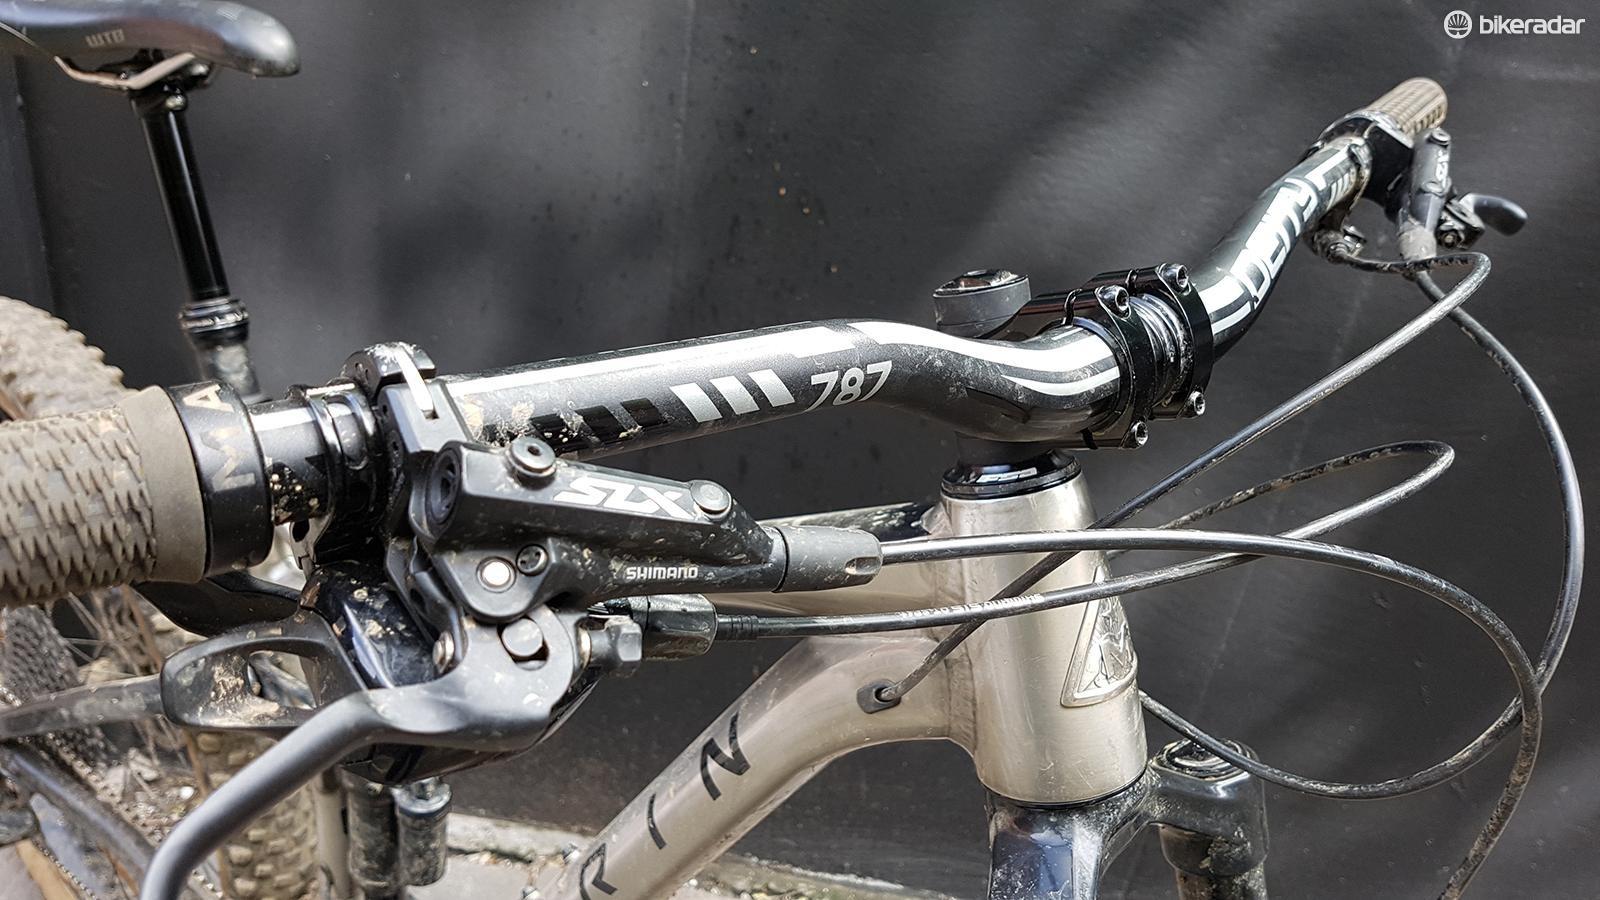 Wide Deity bars aren't often seen as standard on bikes